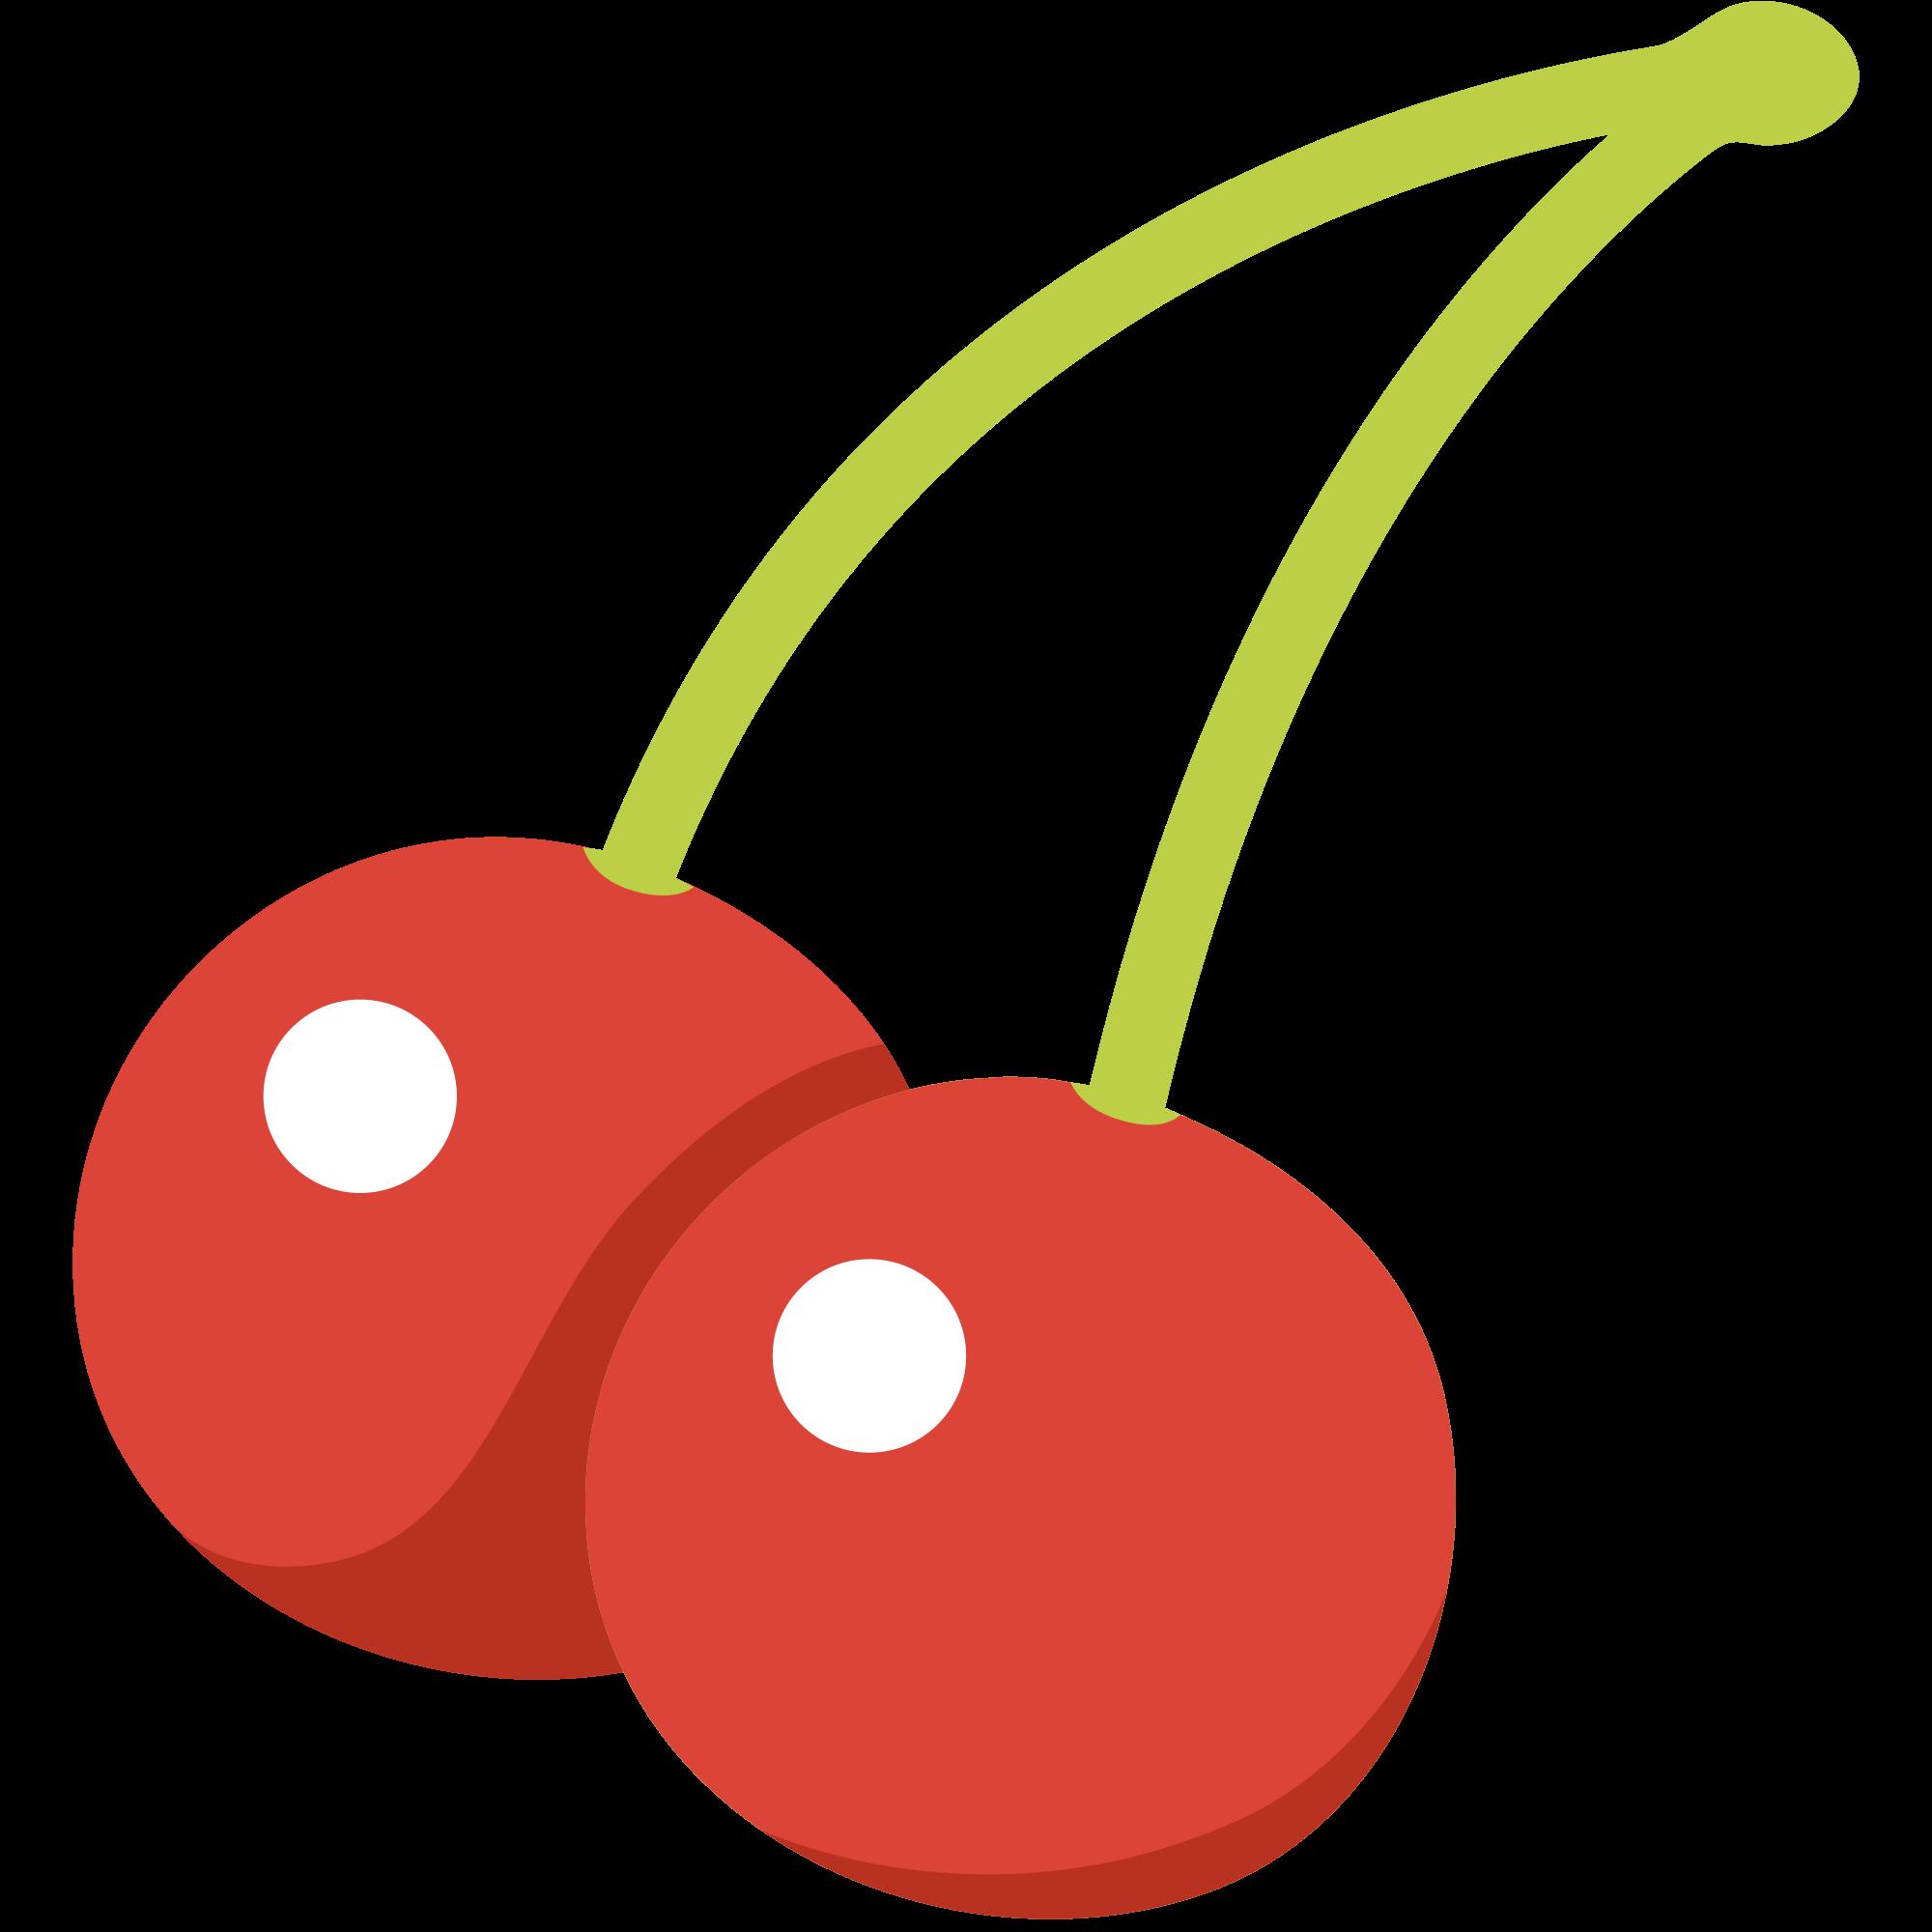 Emoji clipart fruit. File u f svg